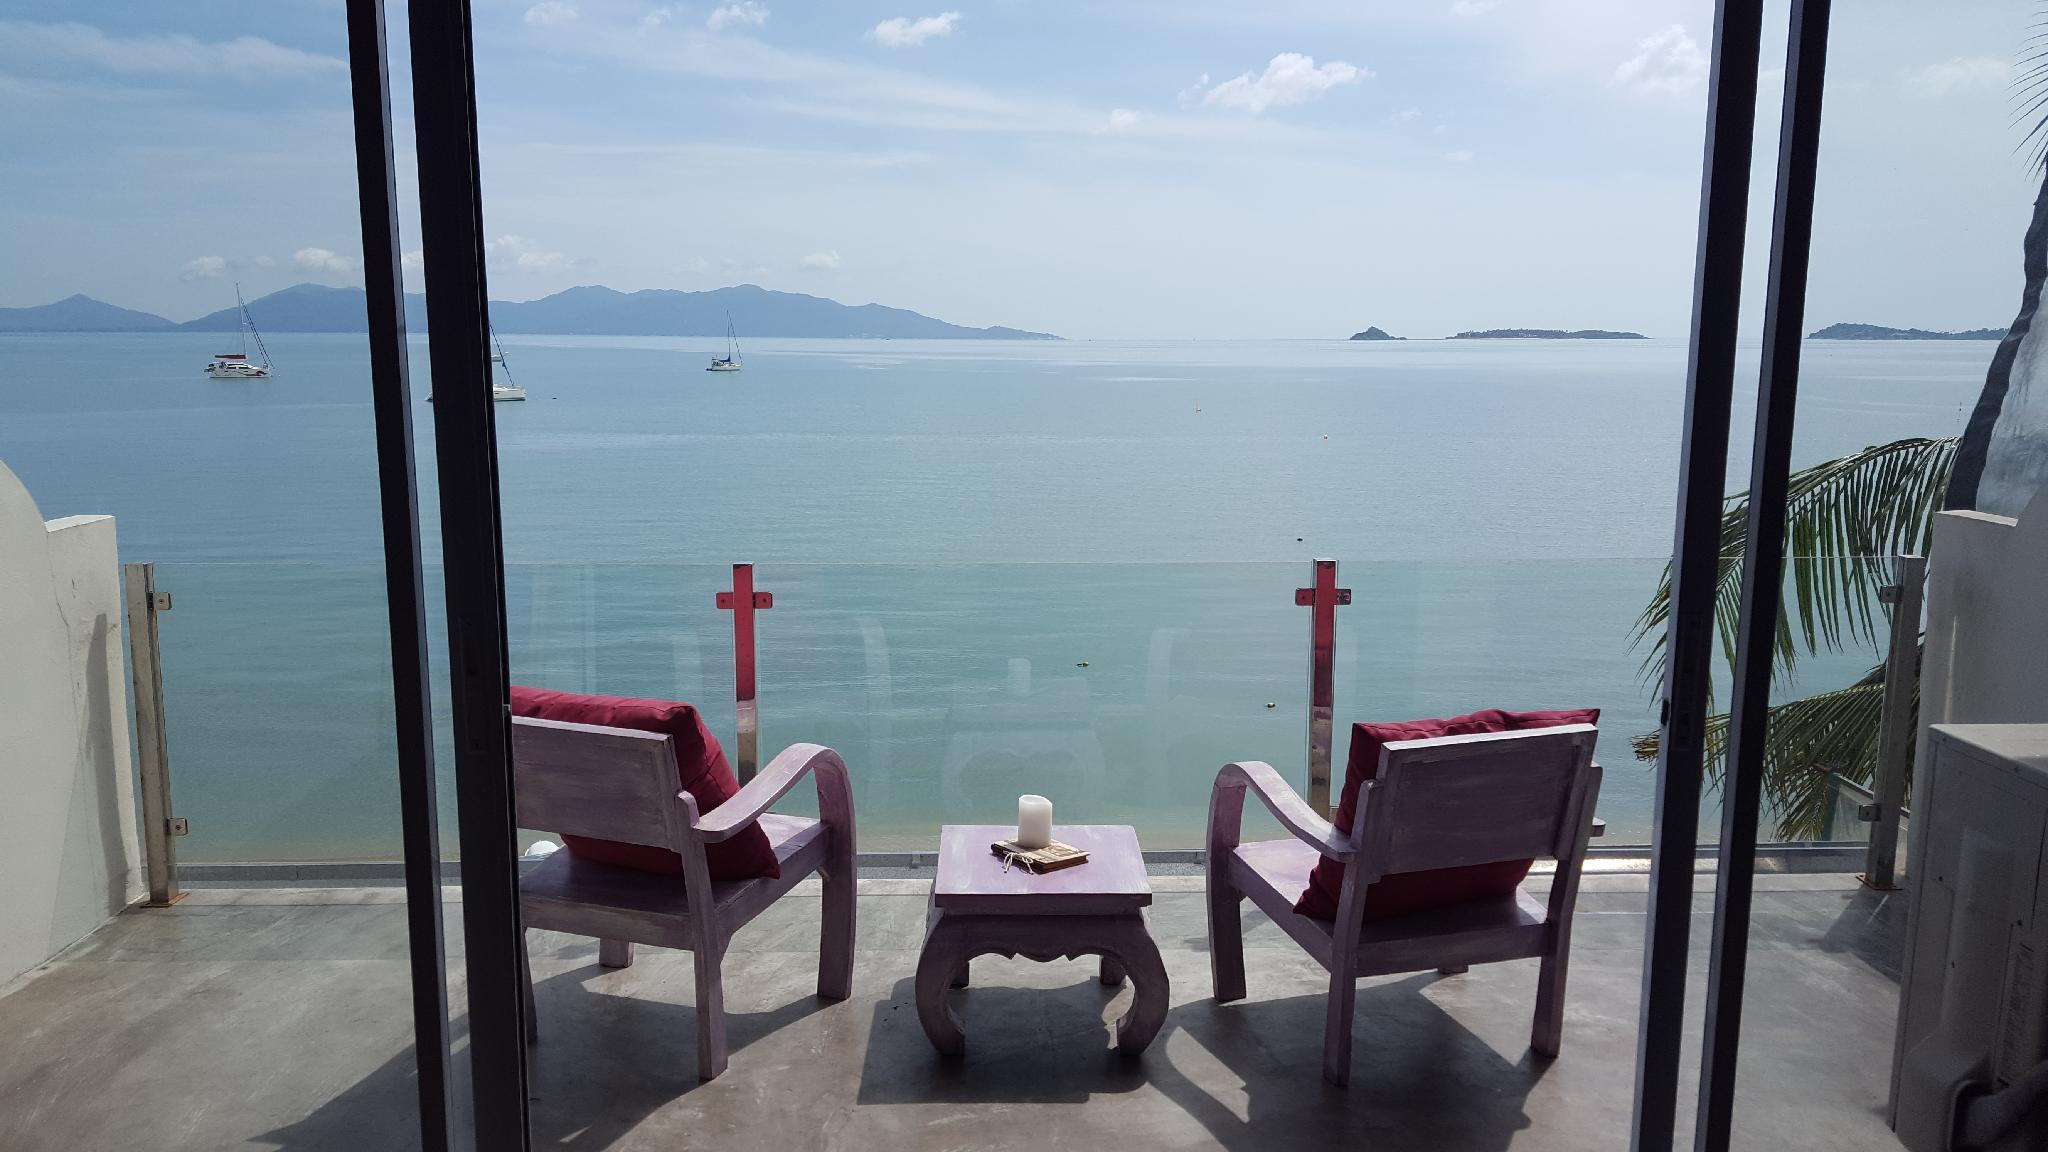 2 Bed Apt Chaweng - walk to beach อพาร์ตเมนต์ 1 ห้องนอน 1 ห้องน้ำส่วนตัว ขนาด 65 ตร.ม. – หาดบ่อผุด